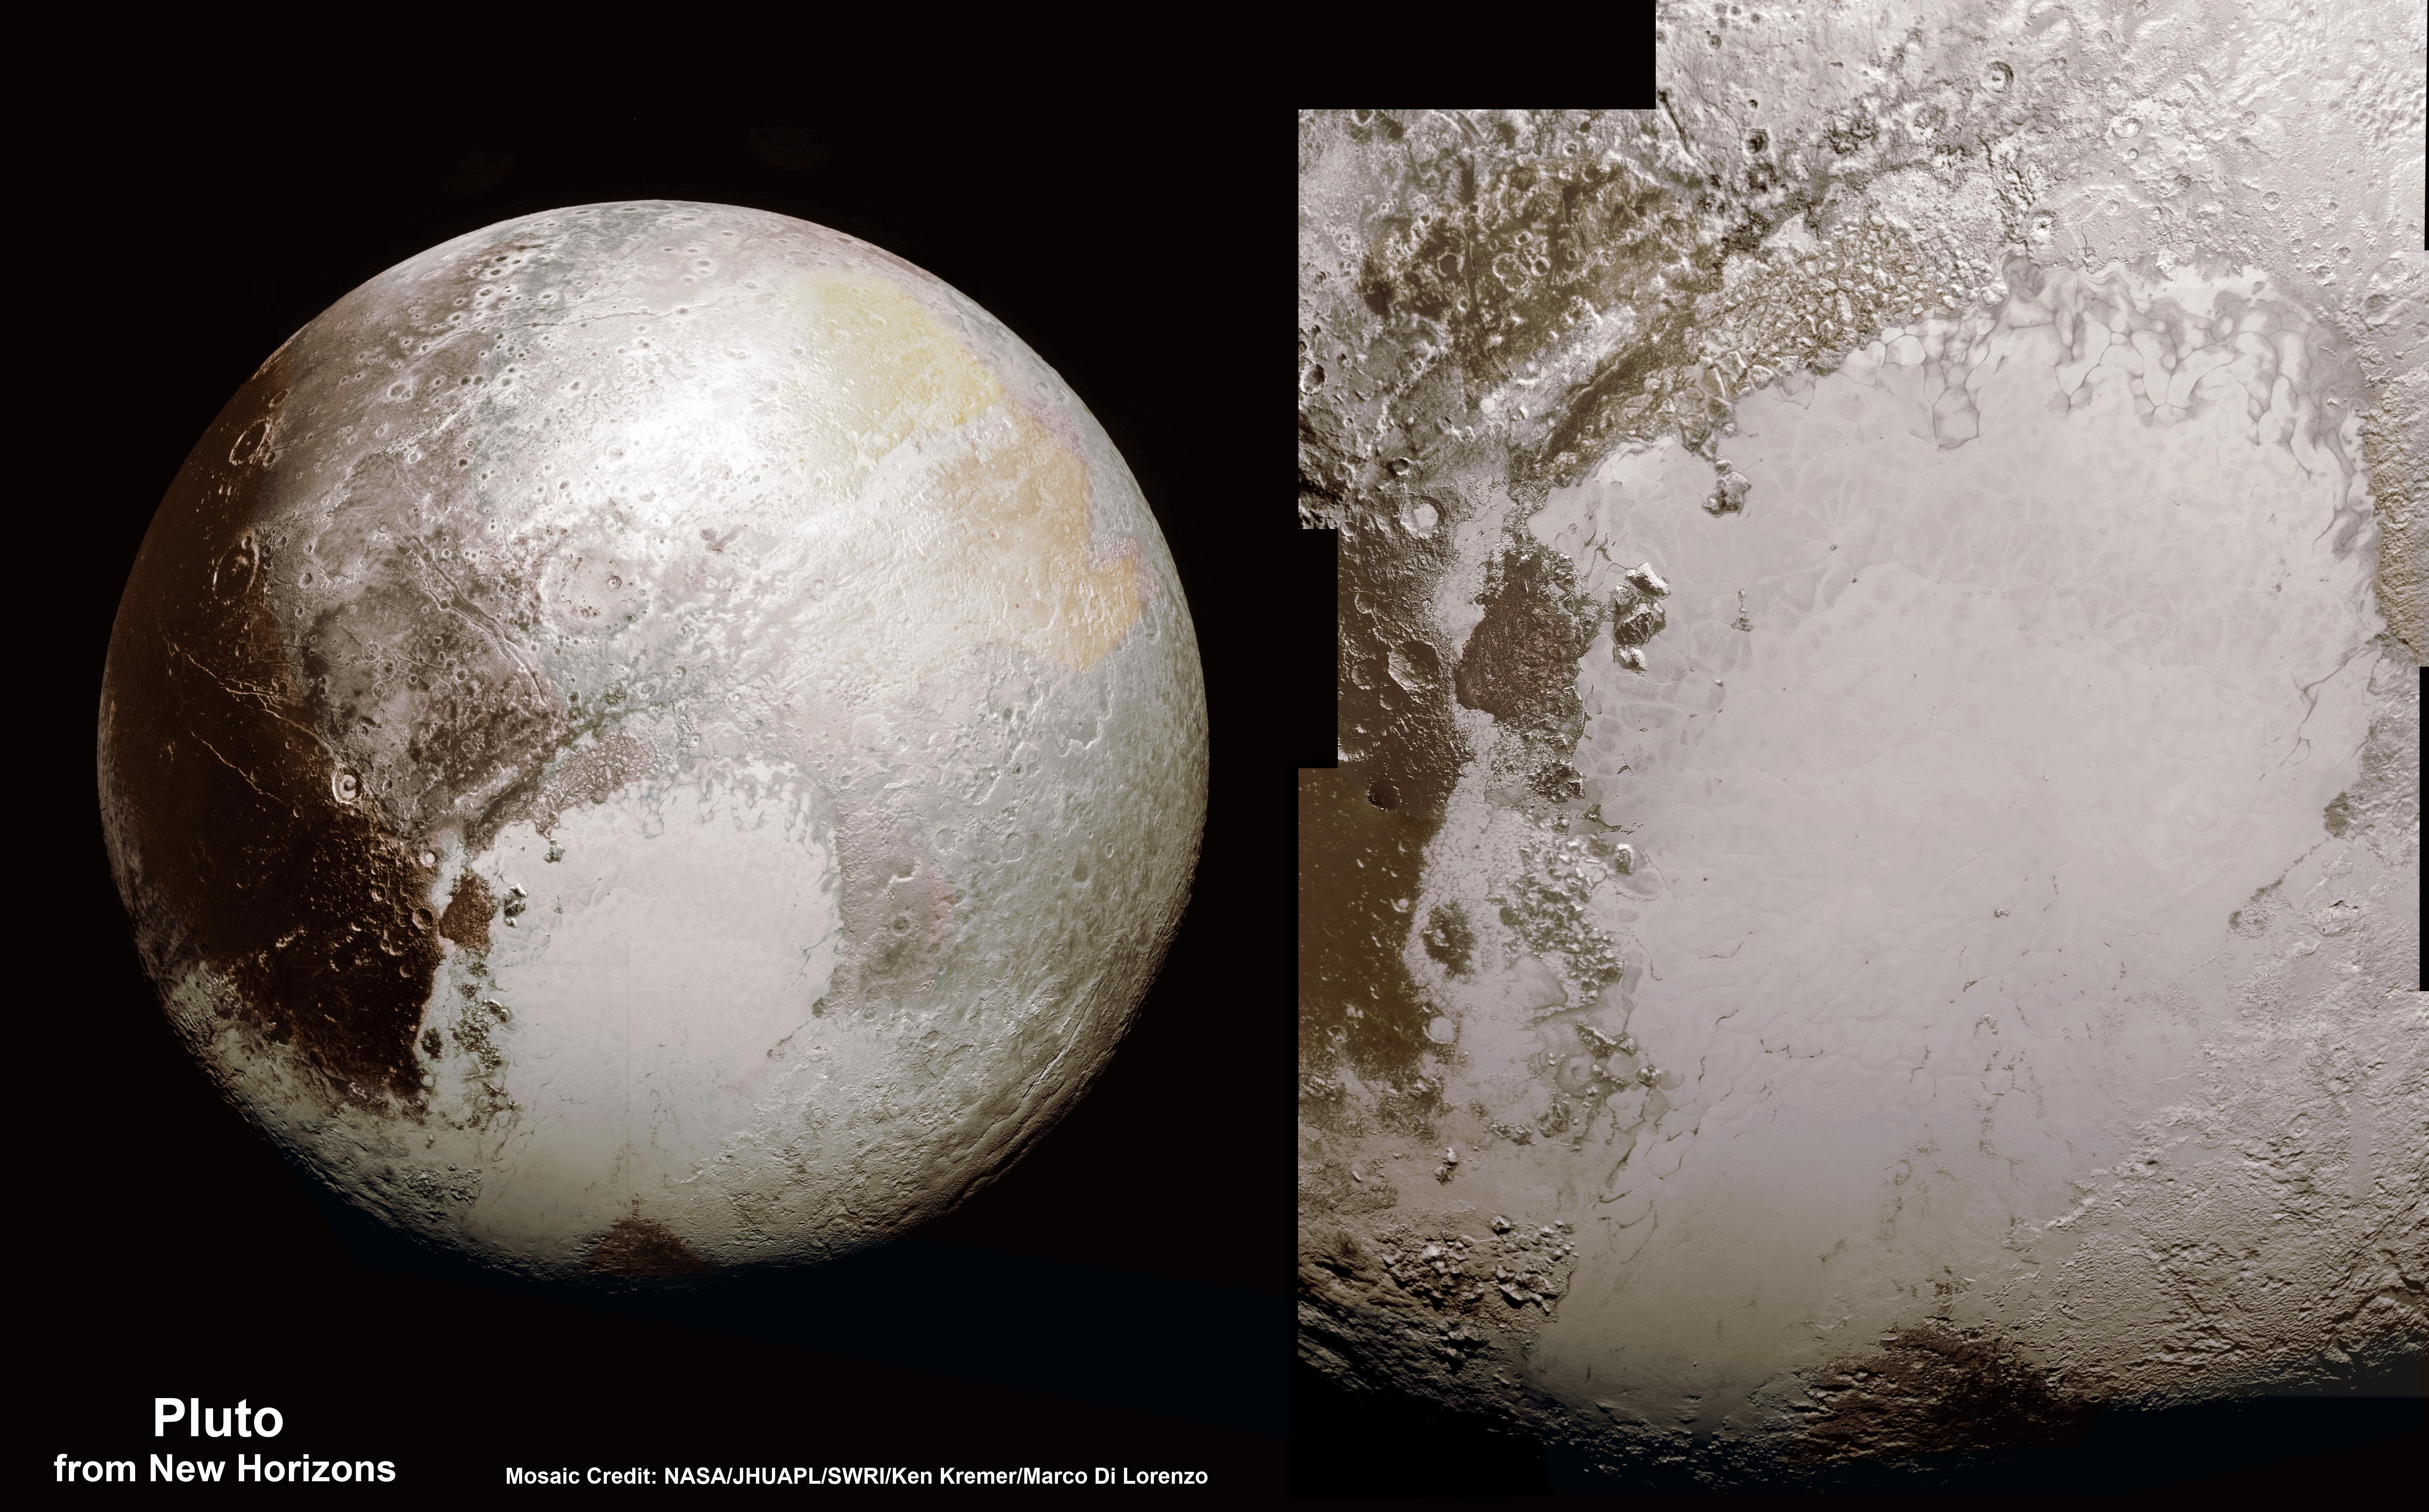 nasa new horizons pluto pictures - HD5928×3690